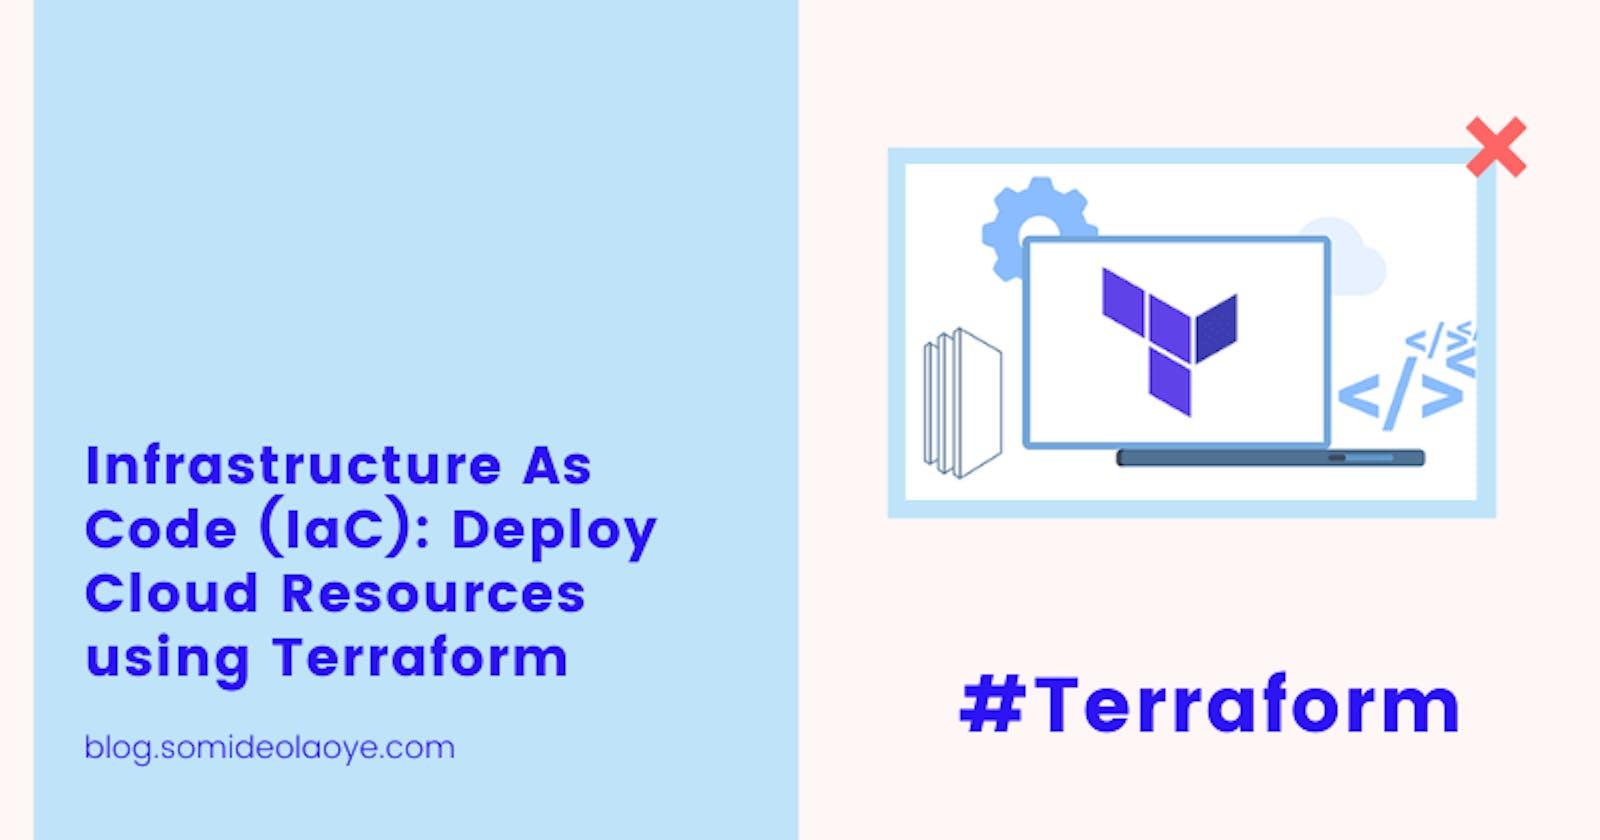 Infrastructure As Code (IaC): Deploy Cloud Resources using Terraform